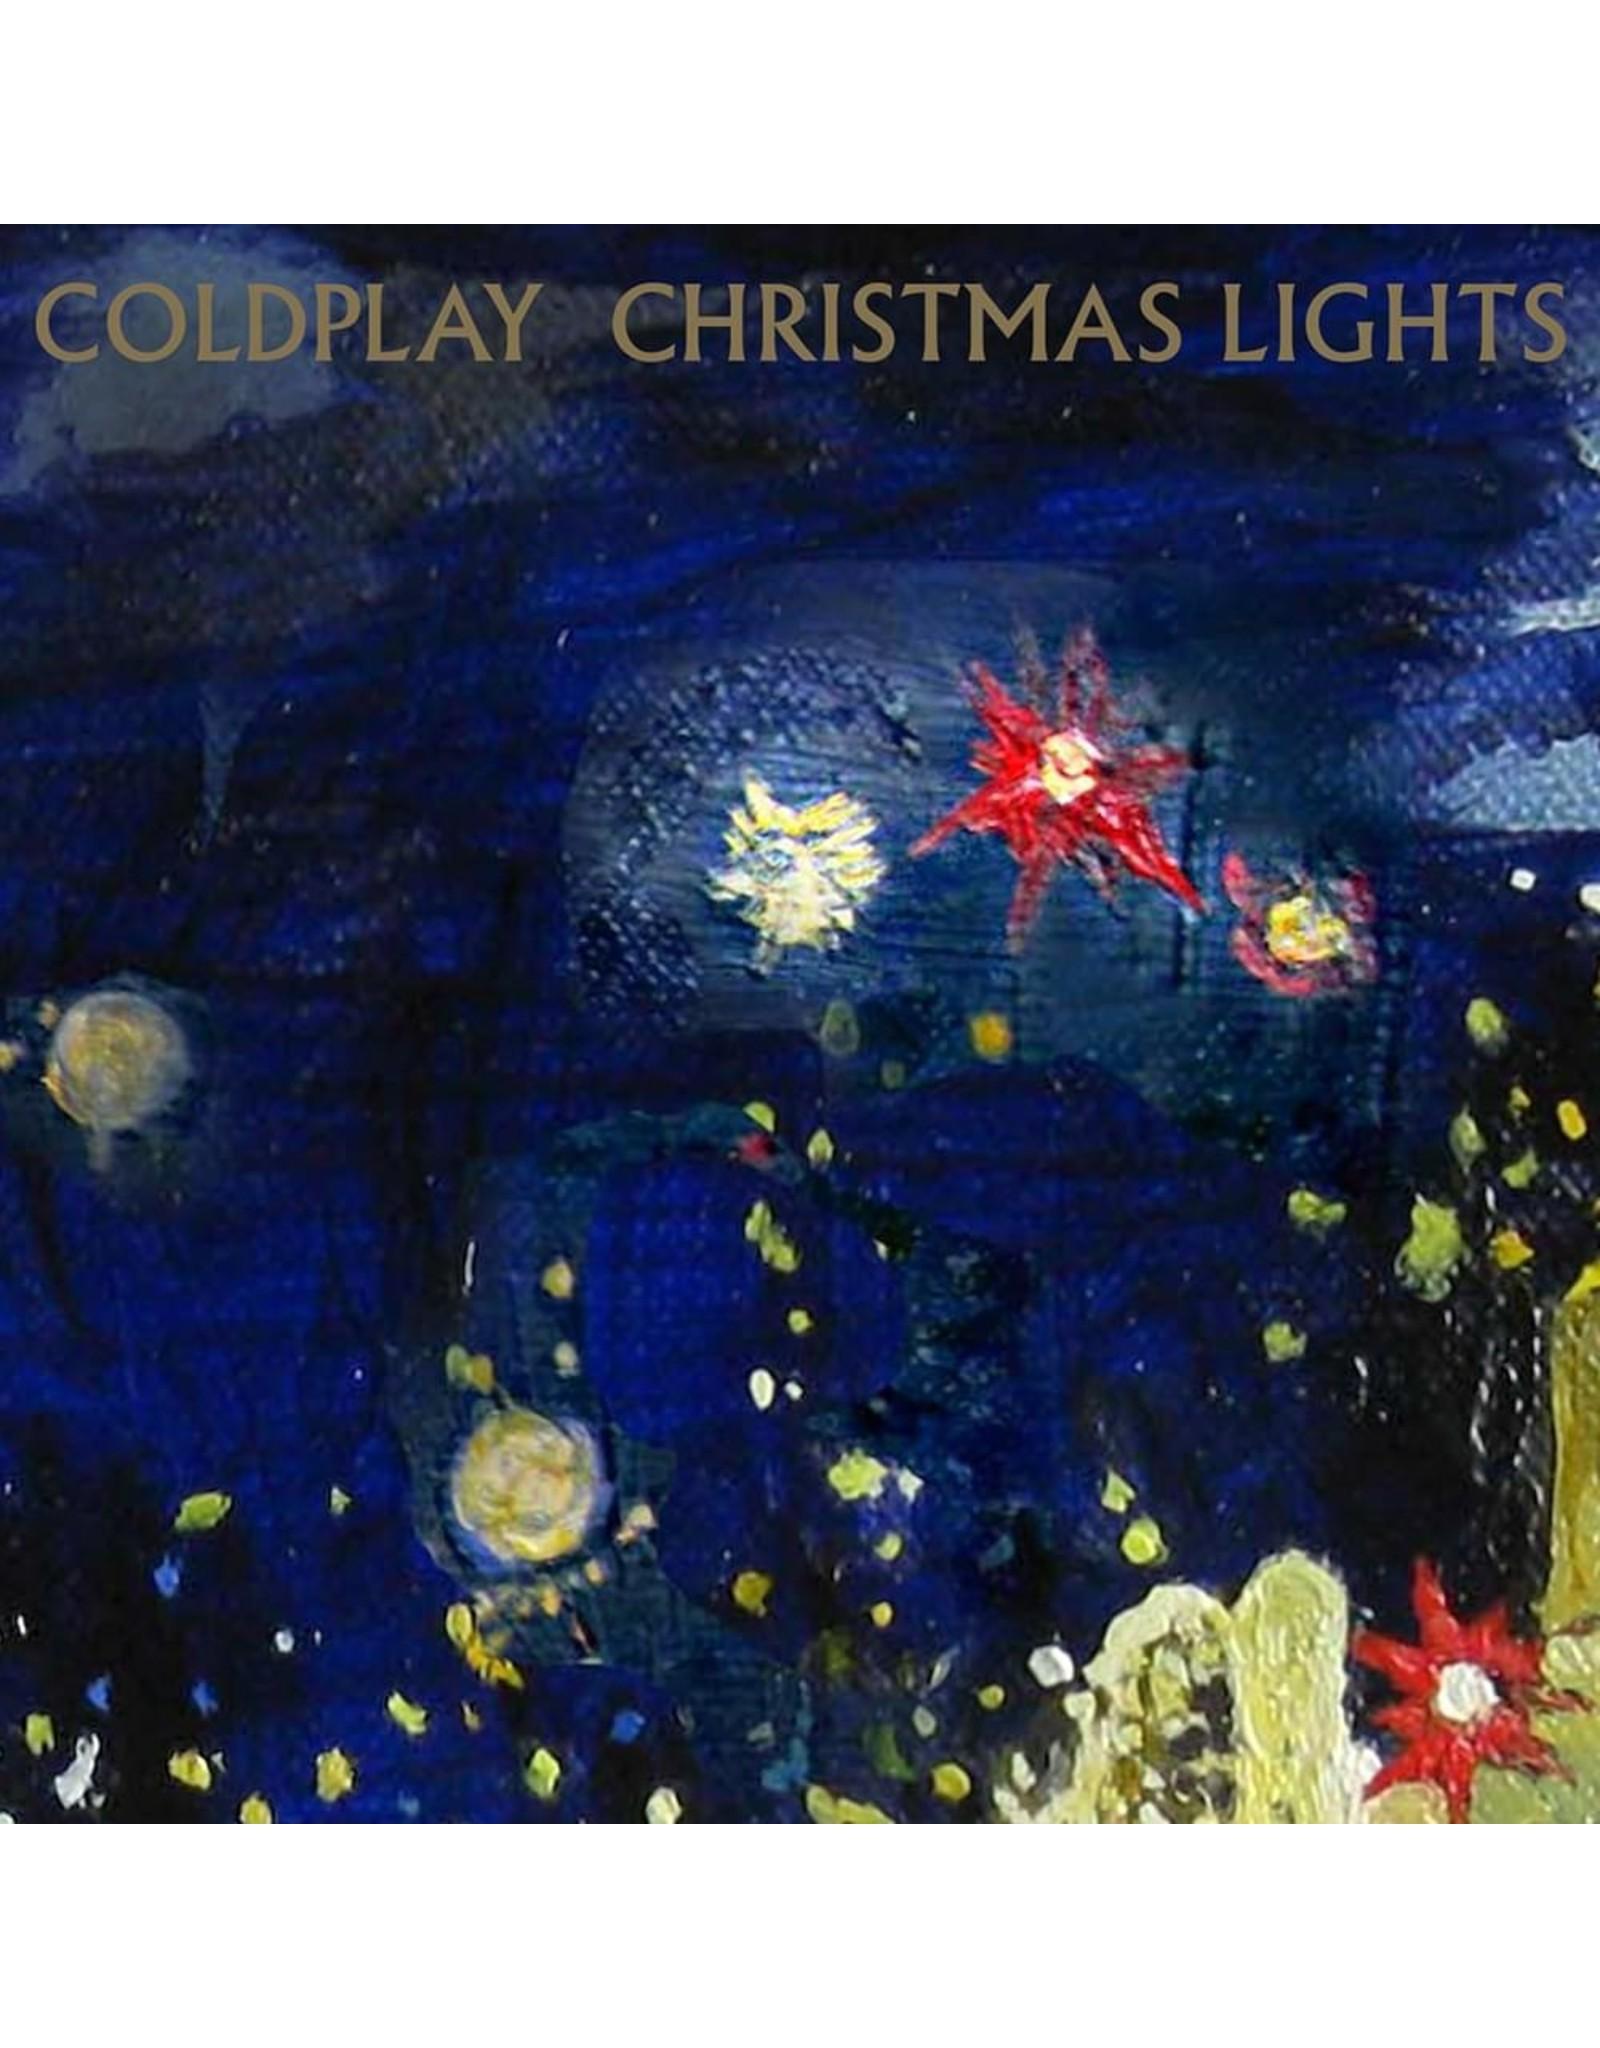 Coldplay - Christmas Lights (Blue Vinyl)